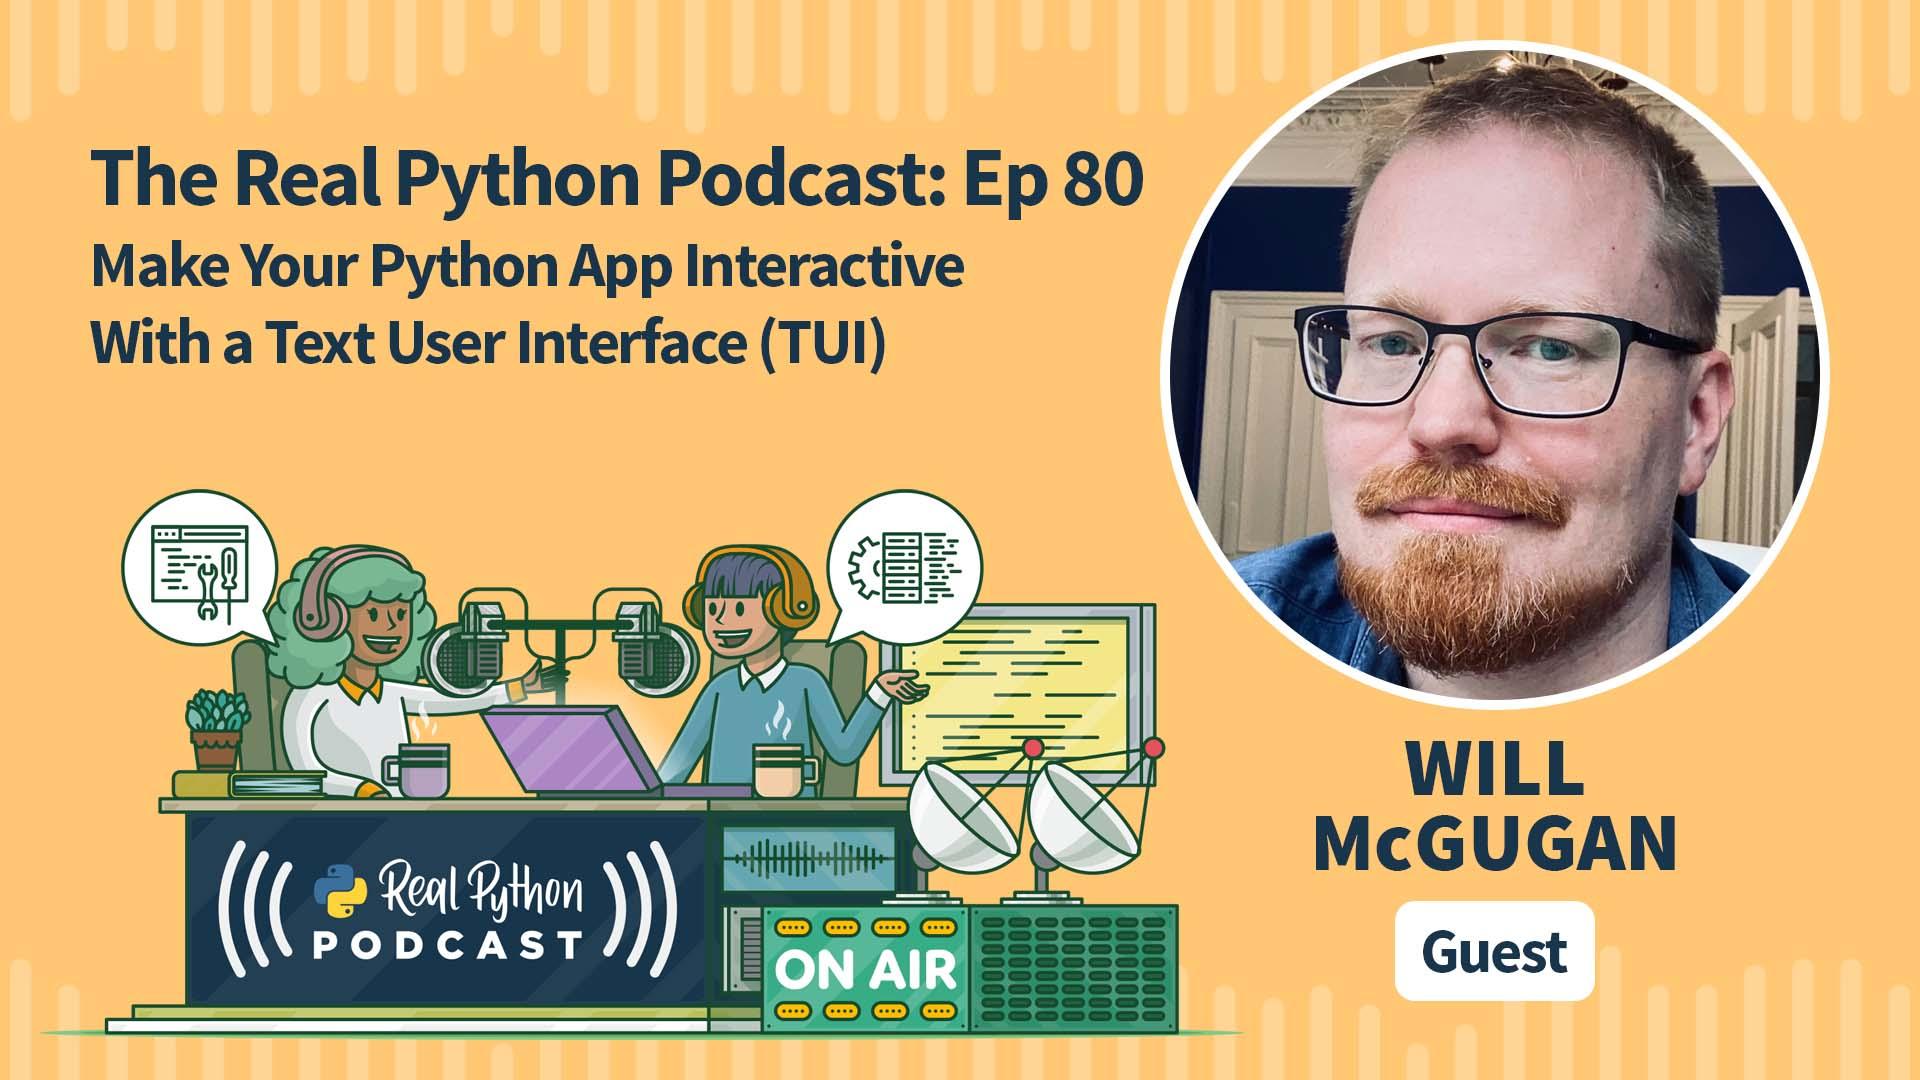 The Real Python Podcast Episode #80 Artwork